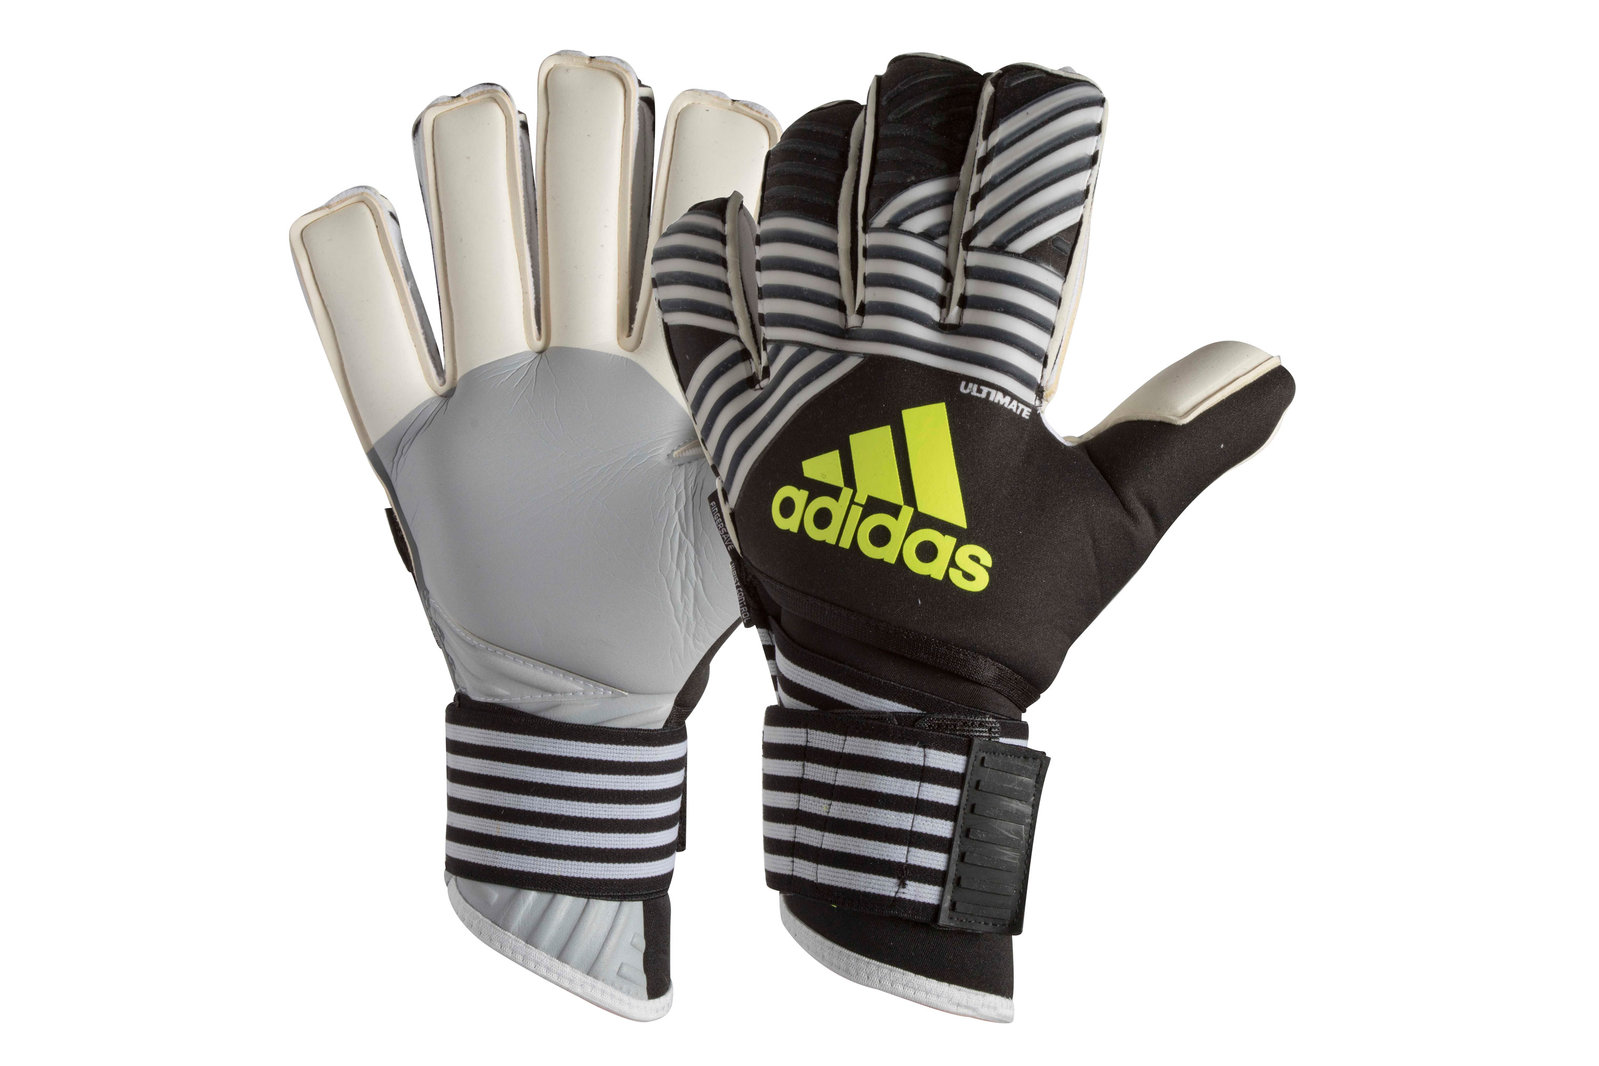 Image of Ace Trans Ultimate Goalkeeper Gloves